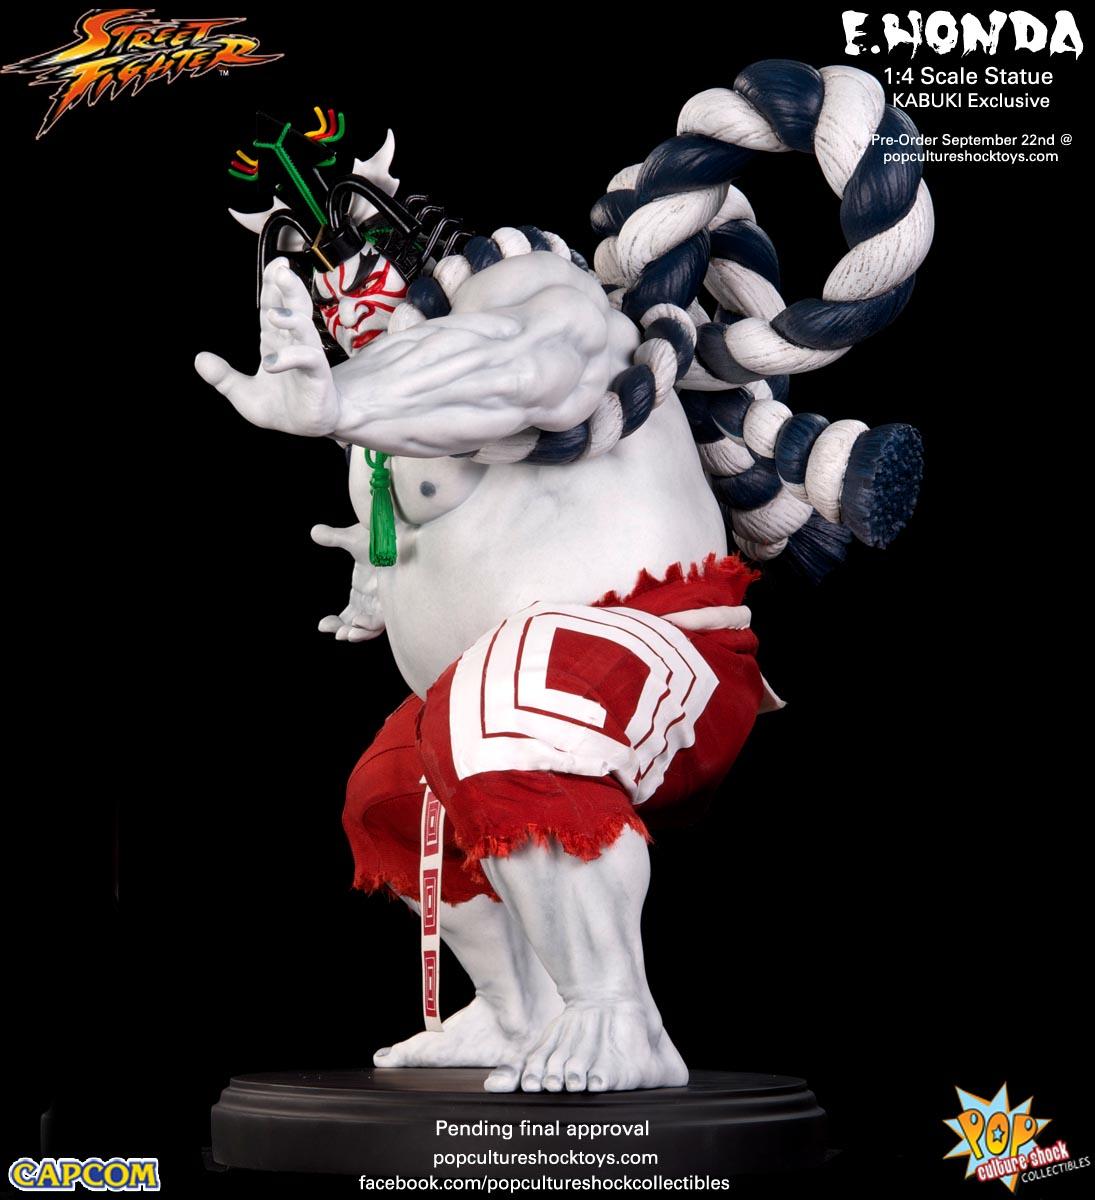 [Pop Culture Shock] Street Fighter: E. Honda 1/4 Statue - Página 3 Street-Fighter-E.-Honda-Kabuki-Statue-012